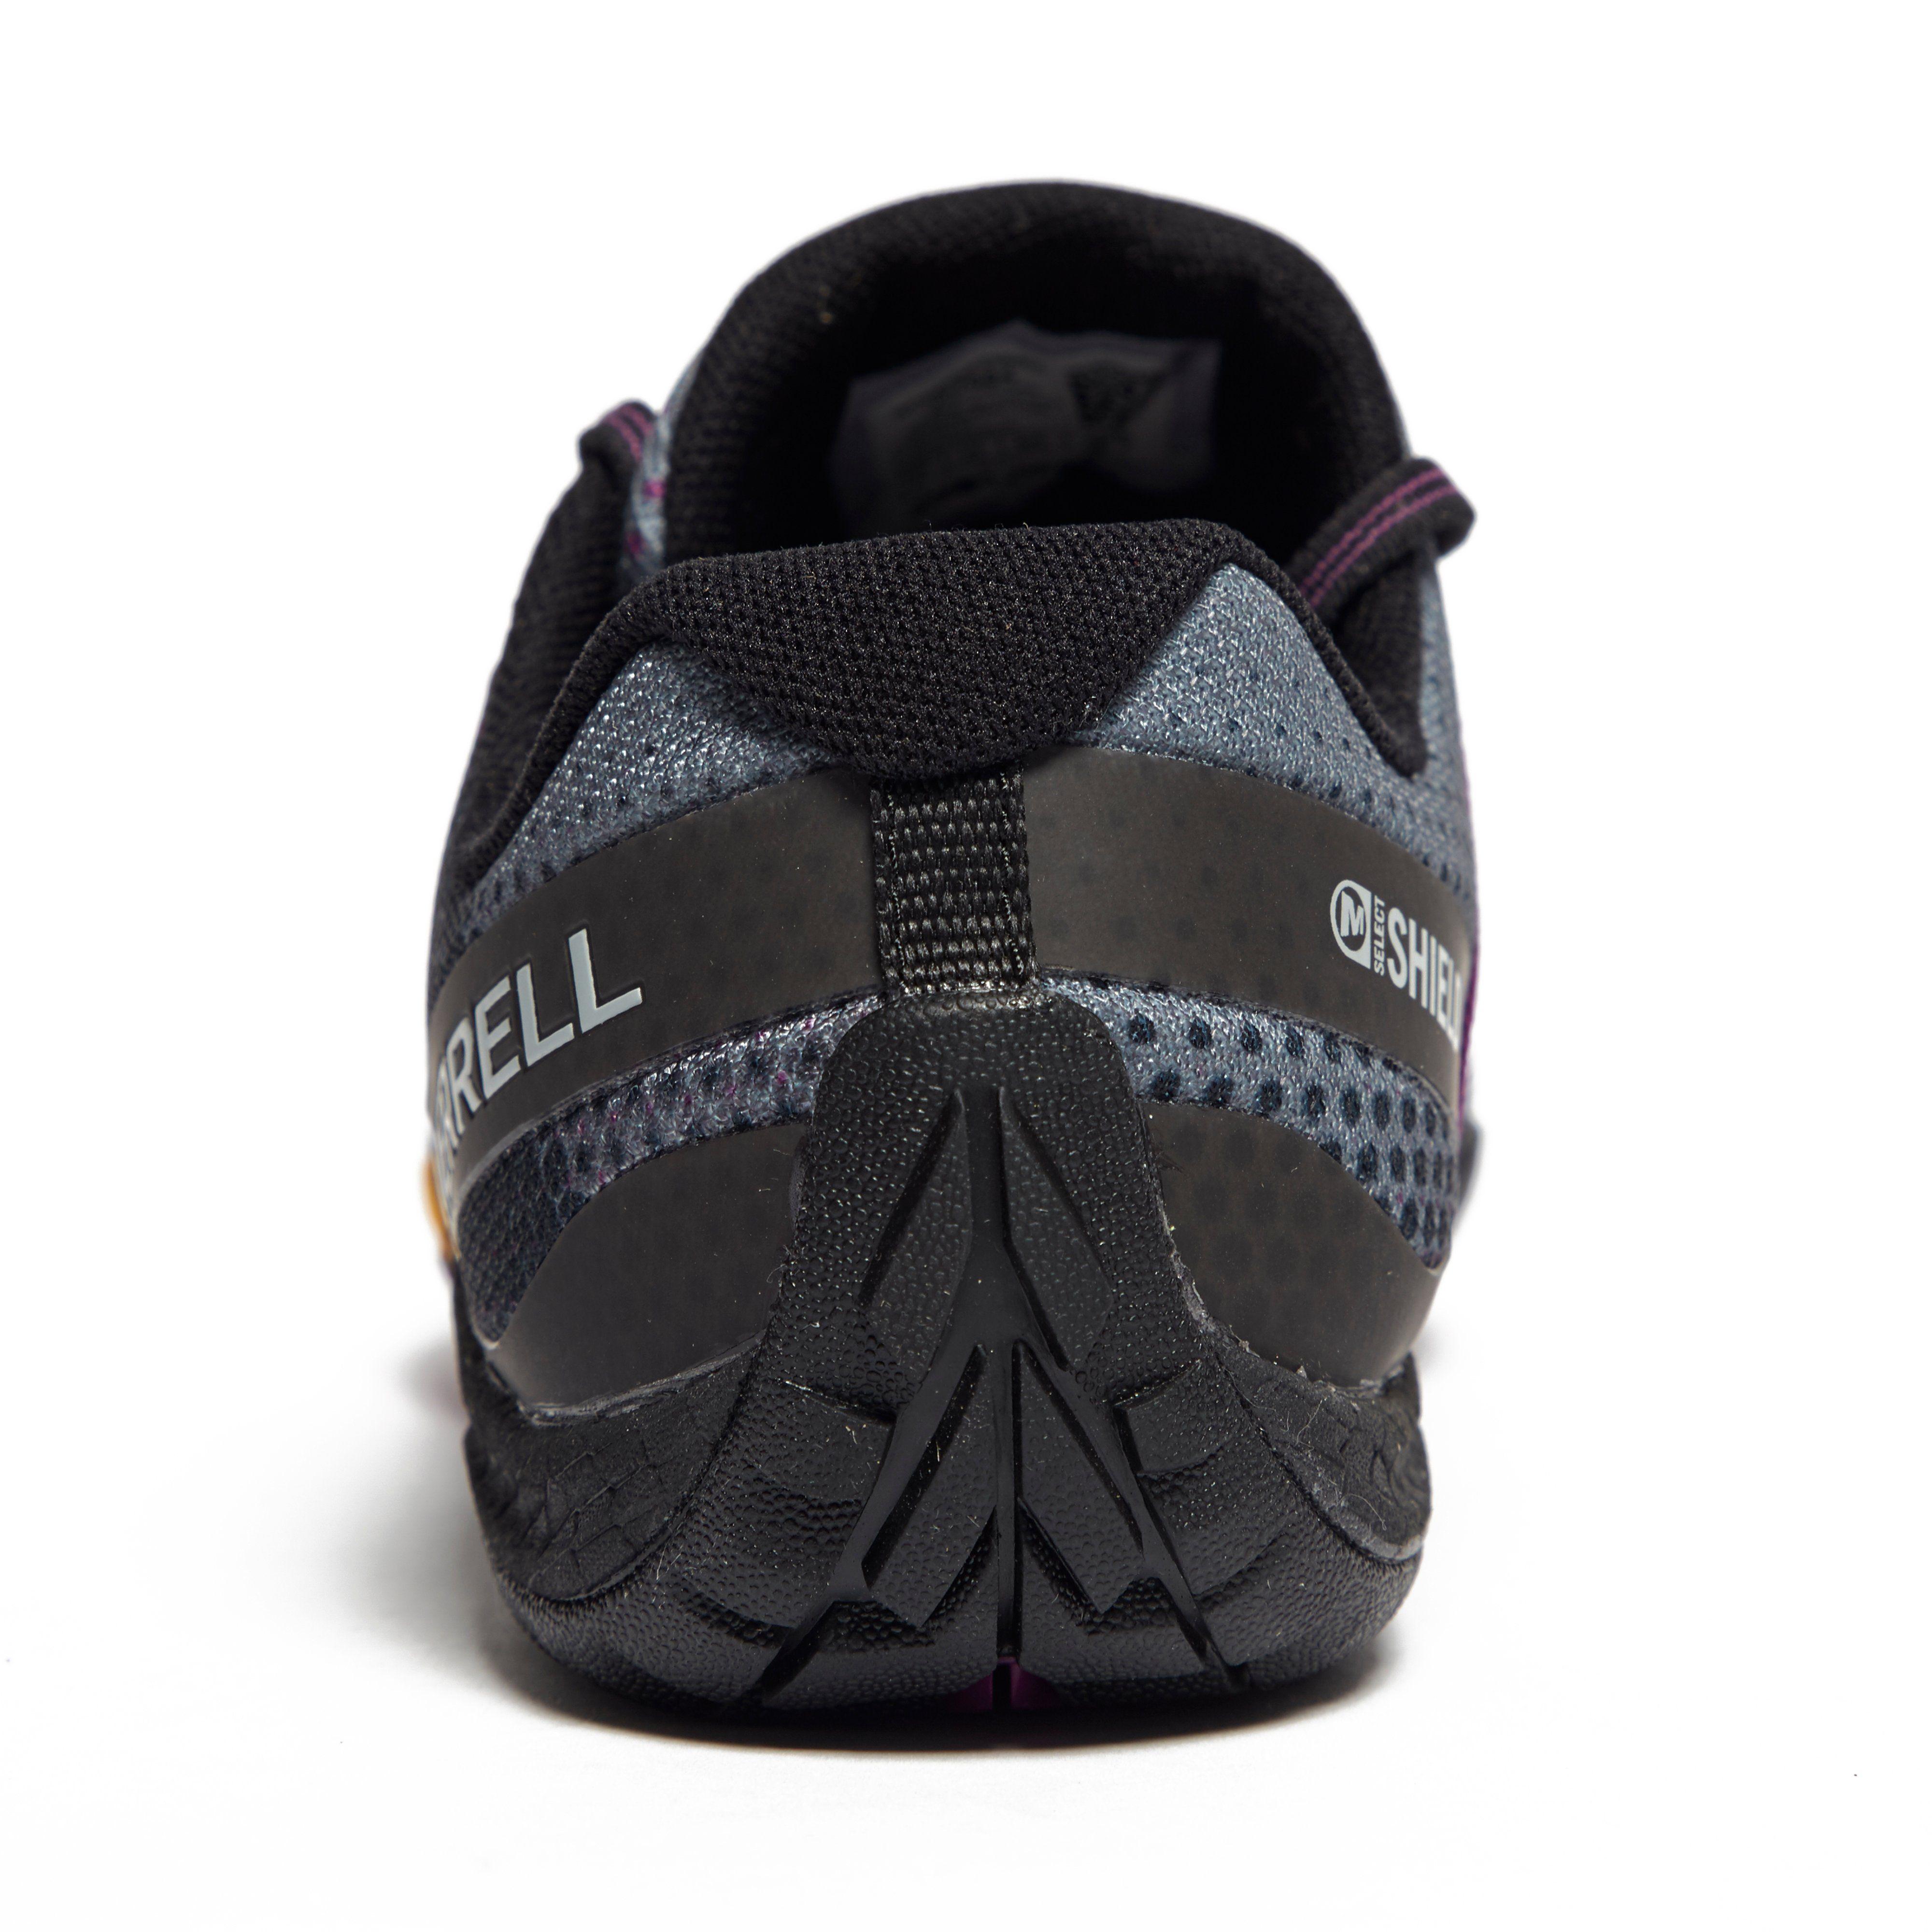 Merrell Trail Glove 4 Shield Women's Trail Running Shoes